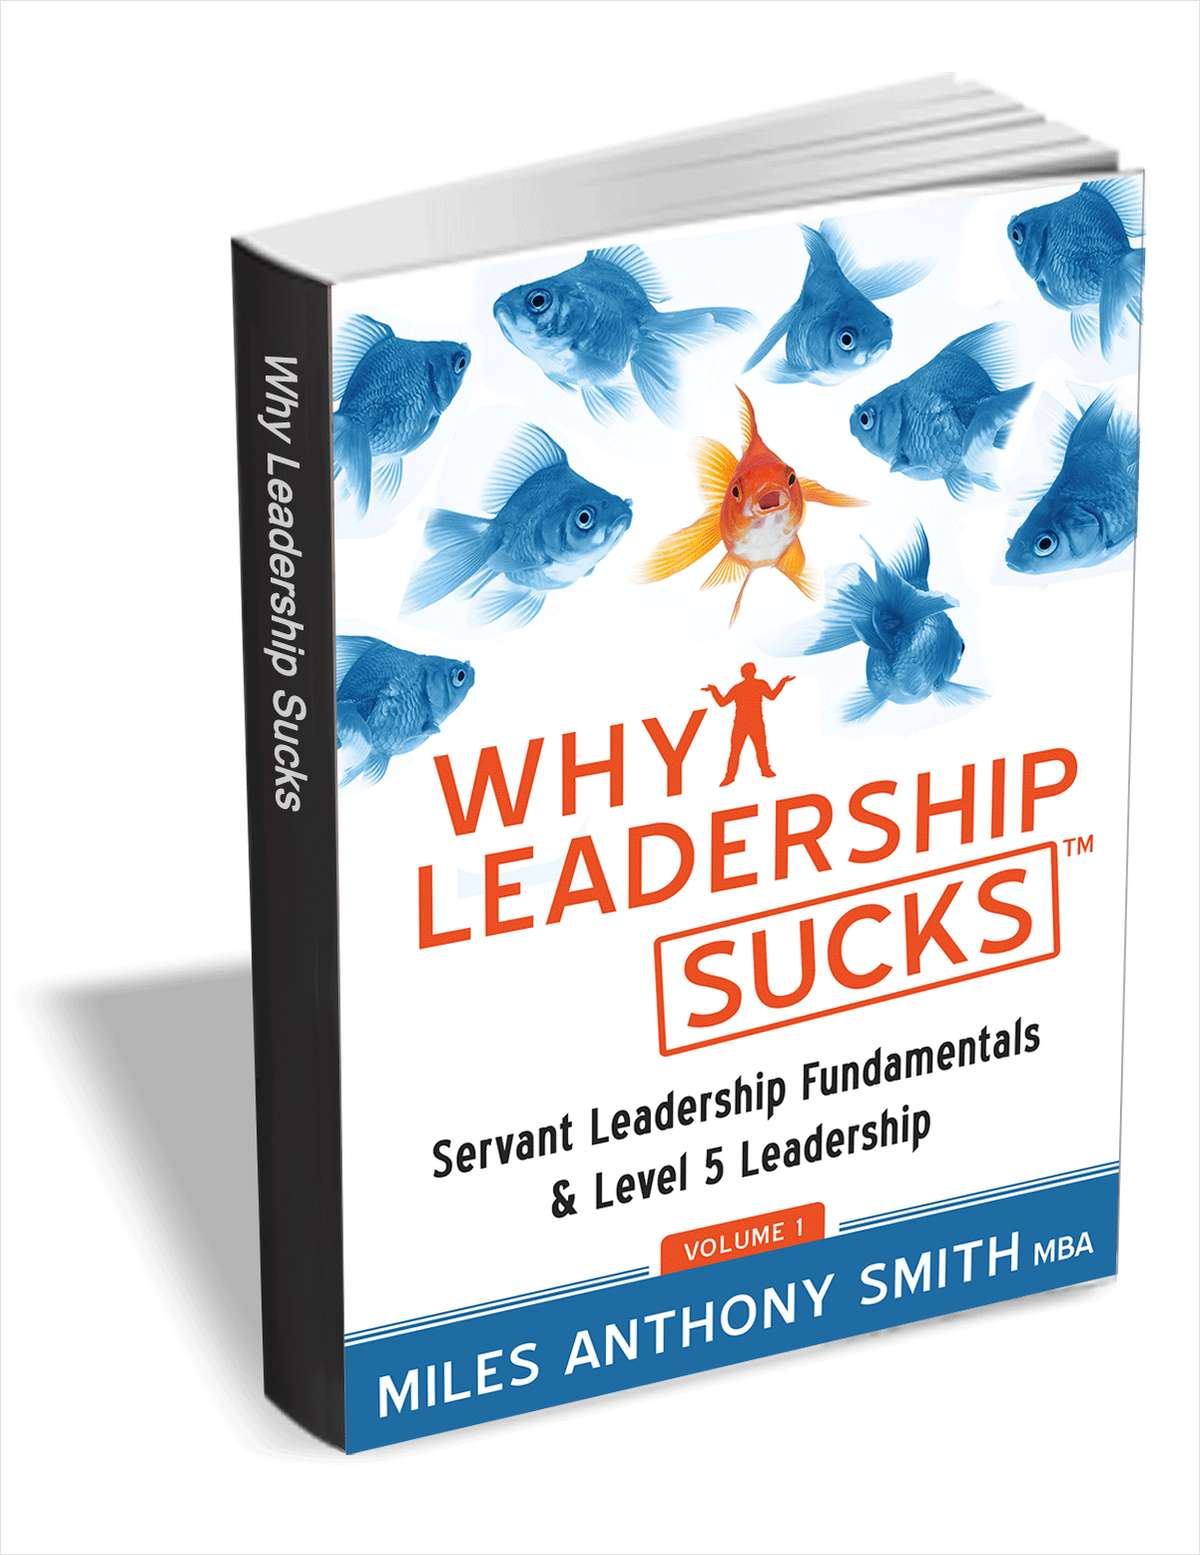 Why Leadership Sucks: Servant Leadership Fundamentals & Level 5 Leadership (Free eBook) A $14.95 Value